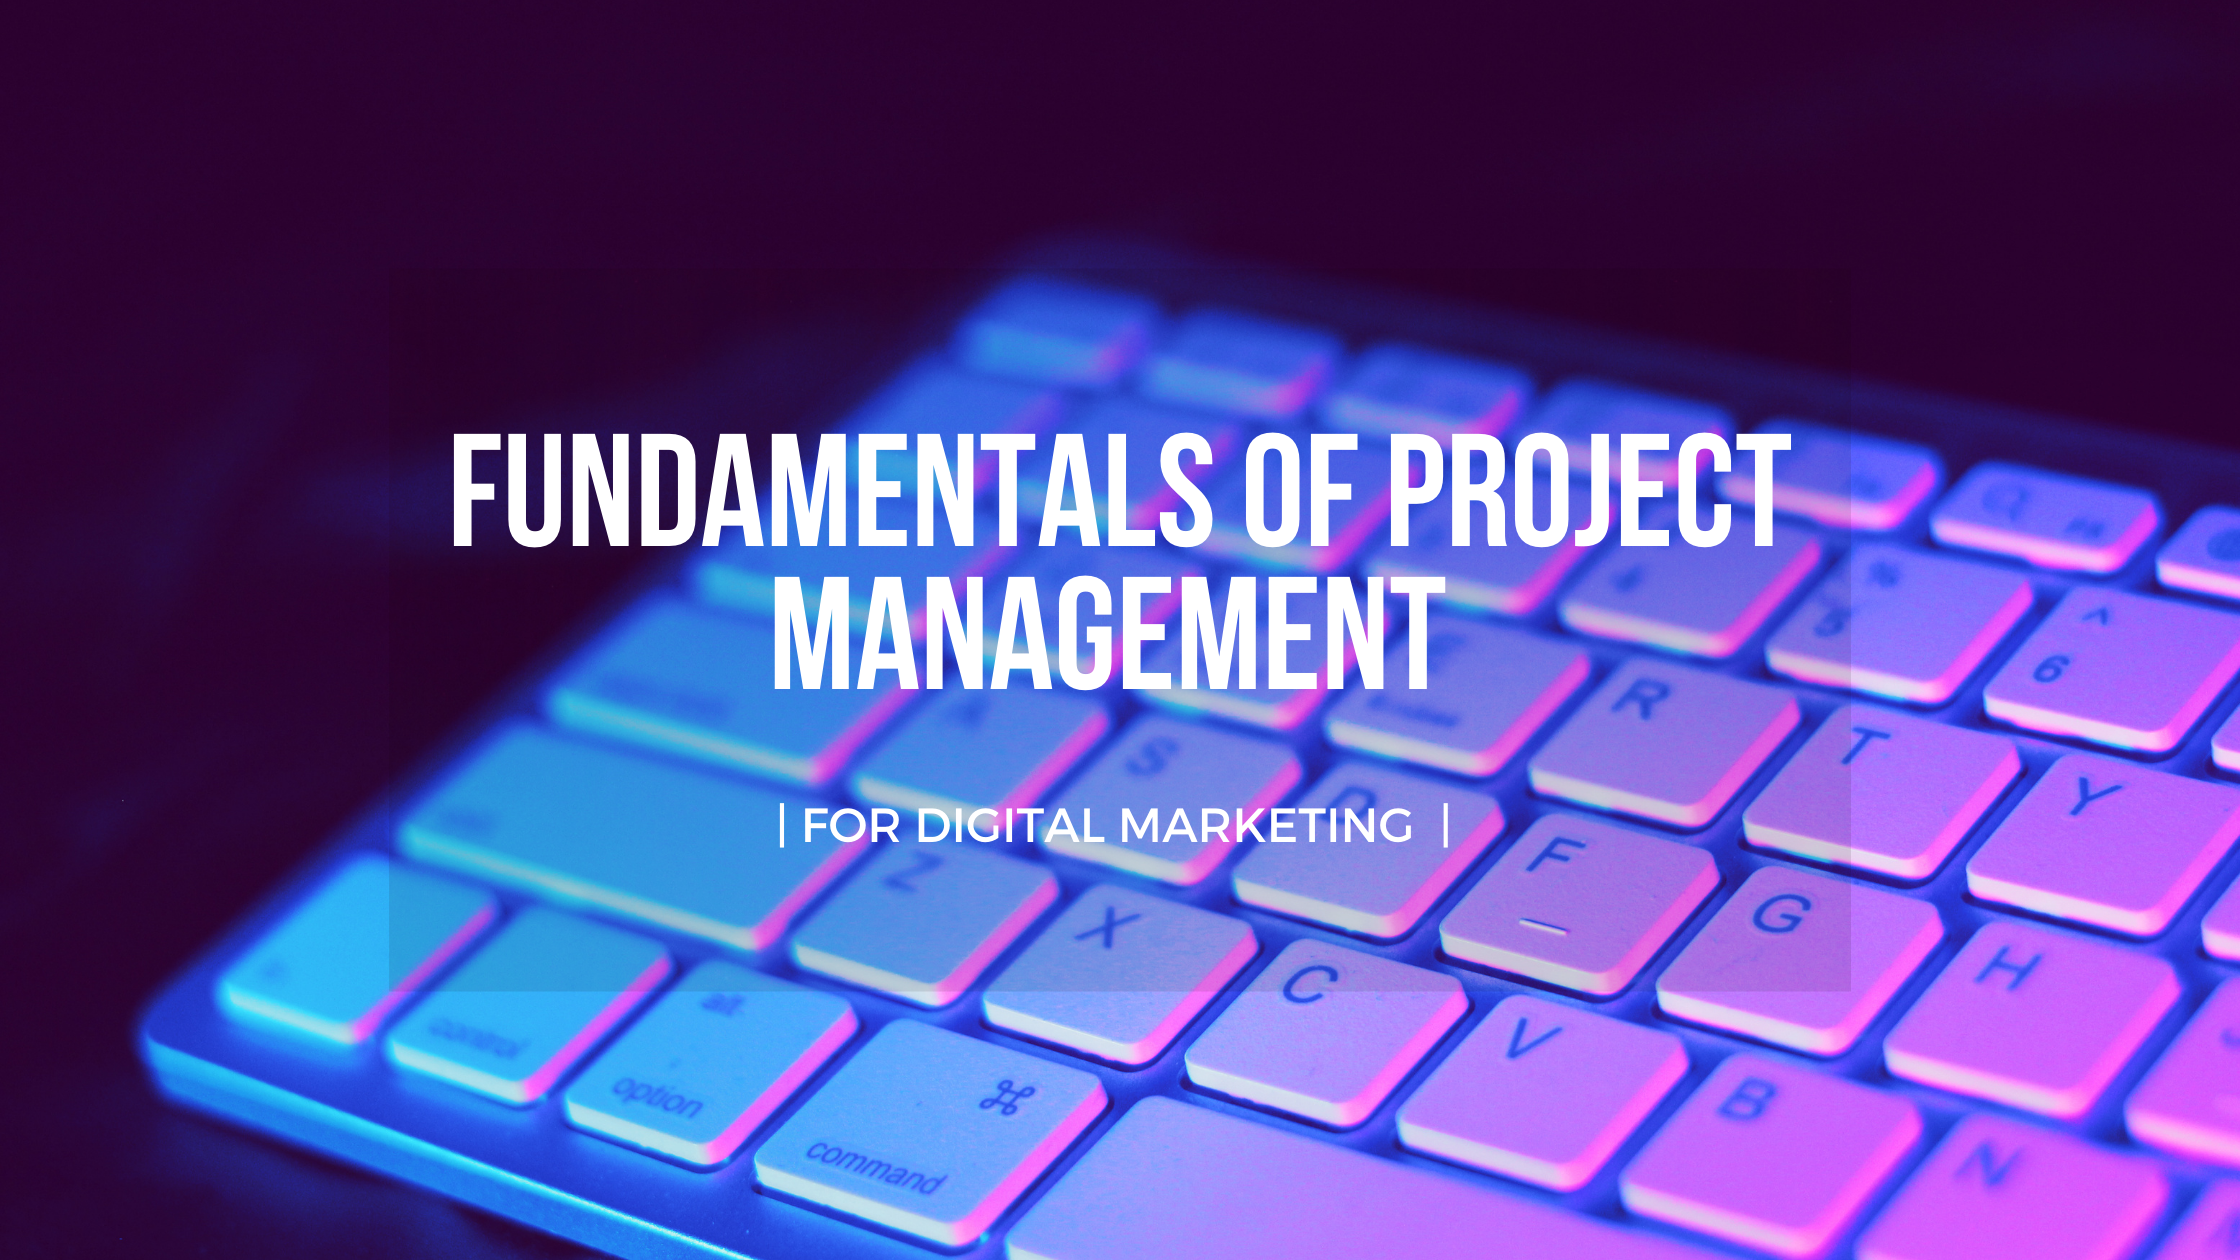 The Foundation Project Management For Digital Marketing || OAK Interlink Company Limited